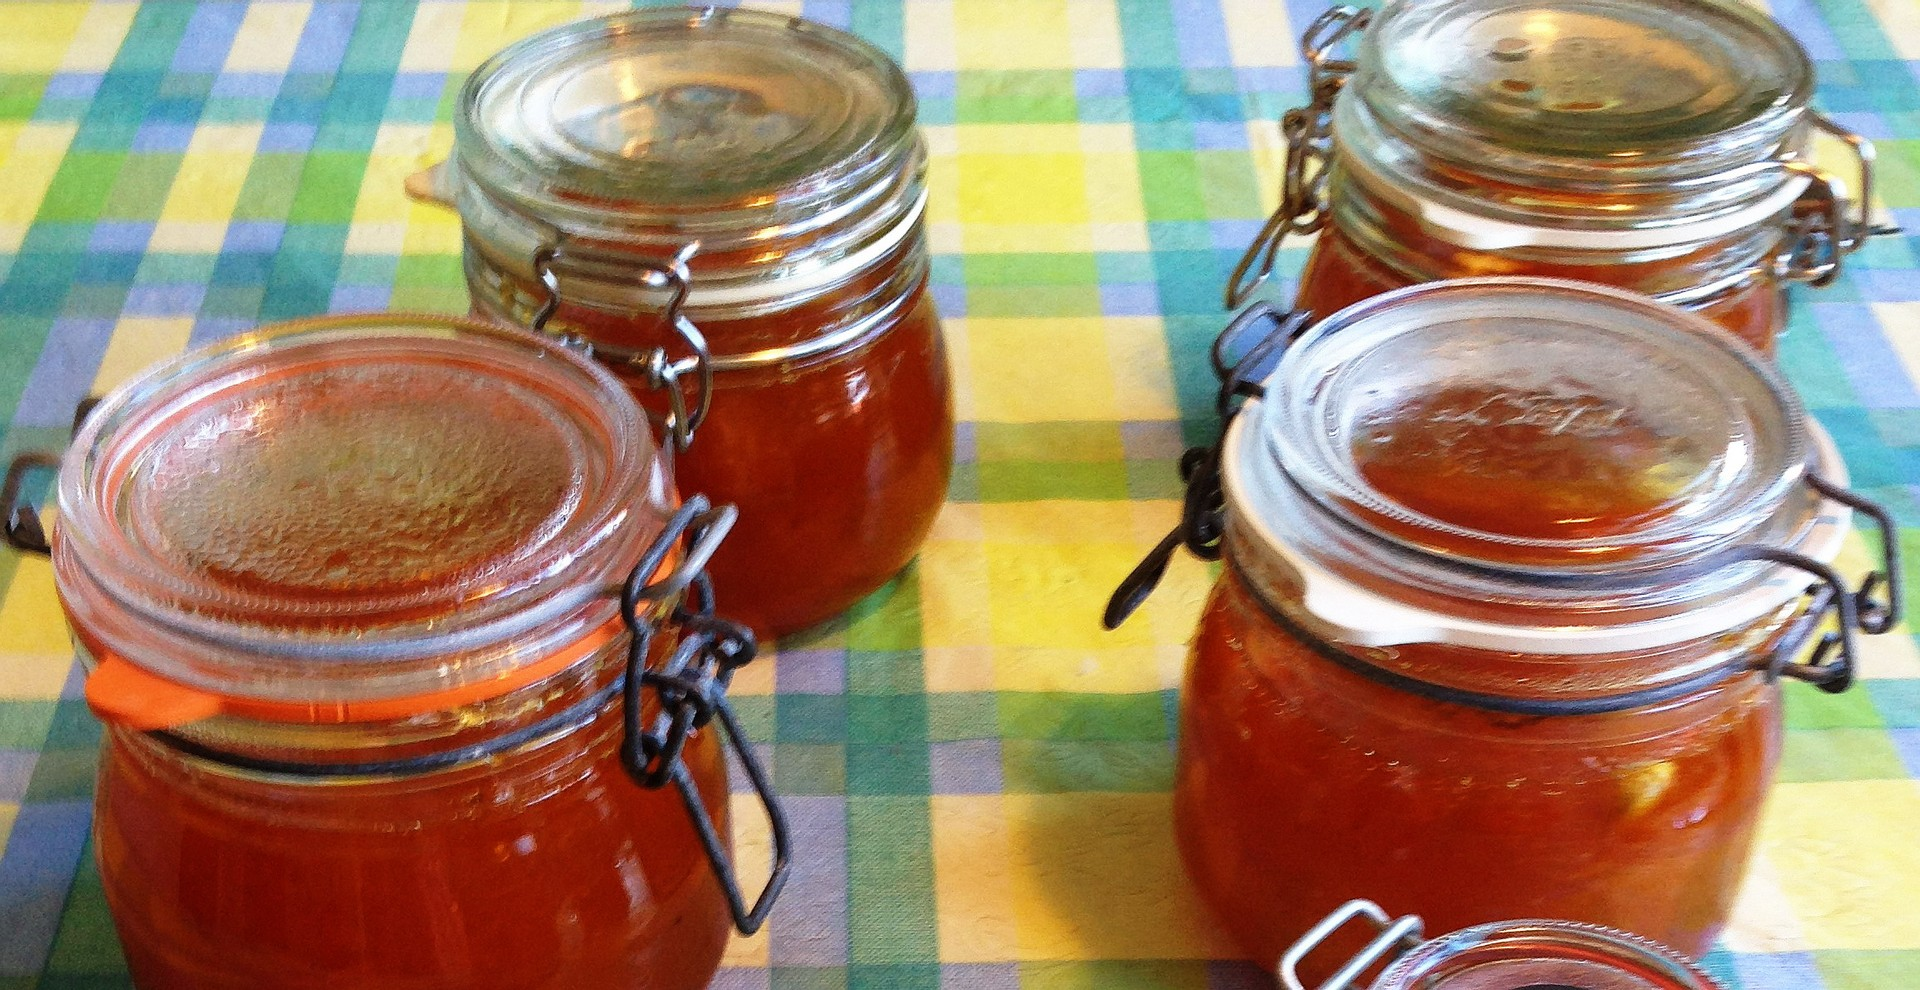 Lizbeth's Apricot Jam Recipe